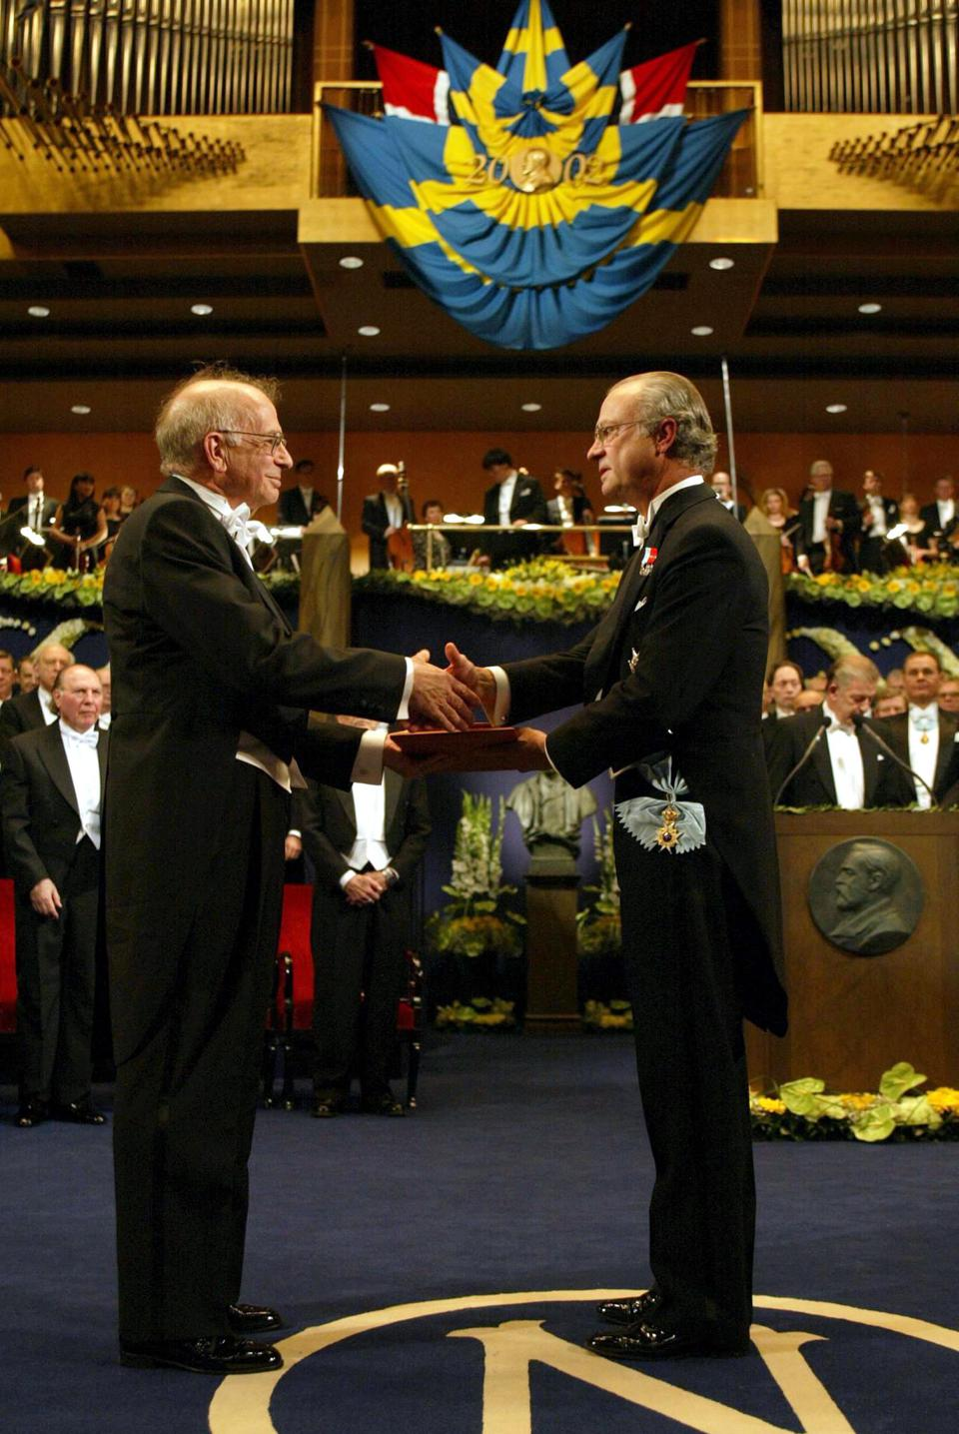 Daniel Kahneman receives the Nobel Prize in Economics